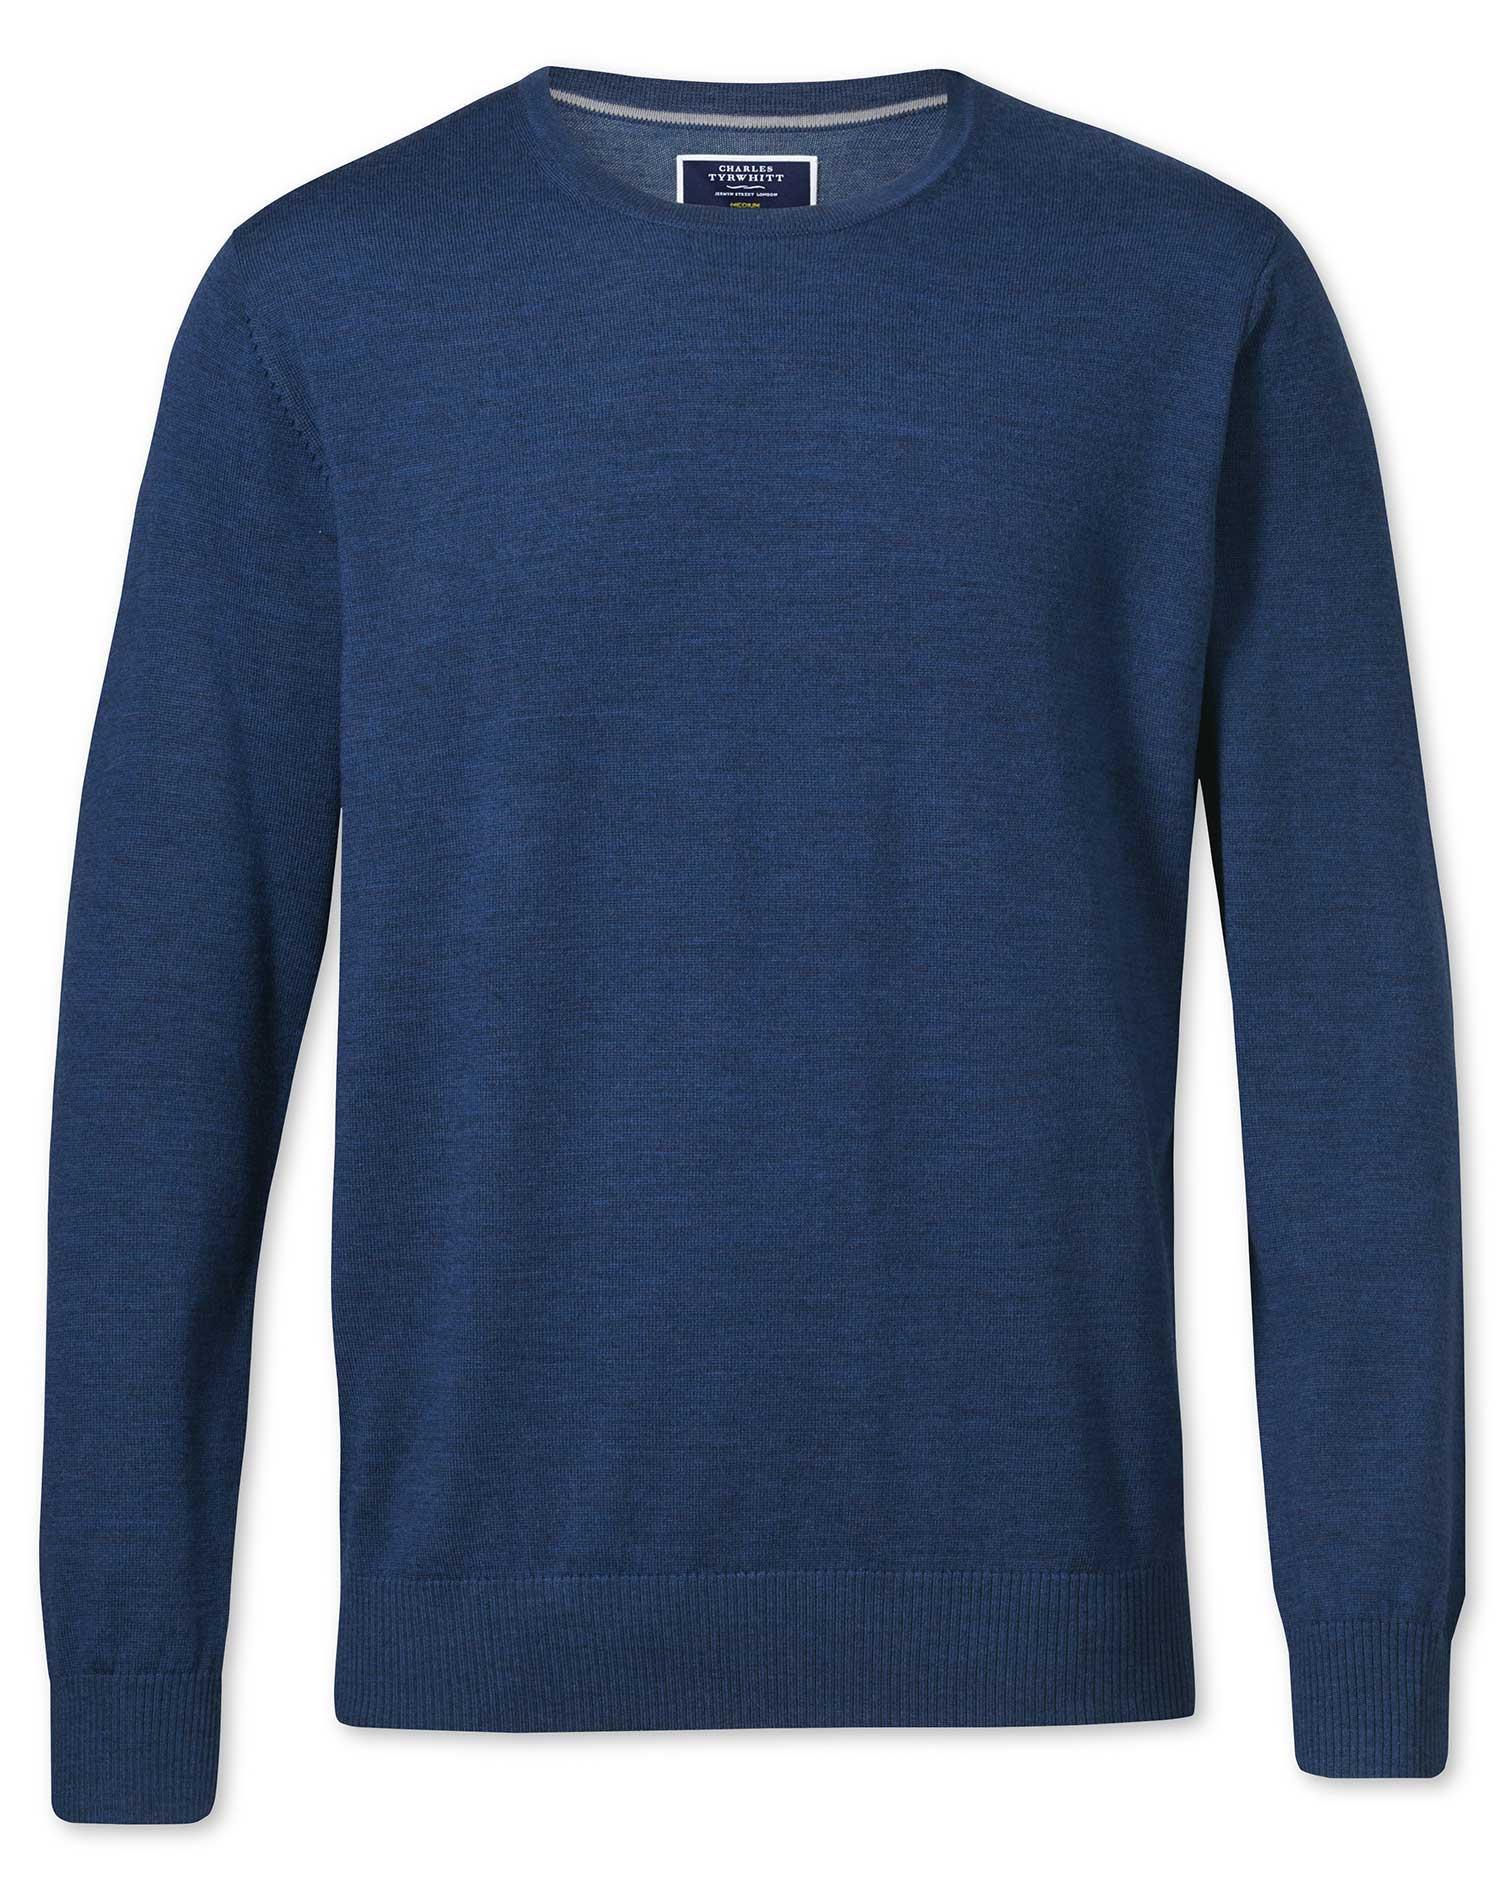 Mid Blue Merino Wool Crew Neck Jumper Size Medium by Charles Tyrwhitt